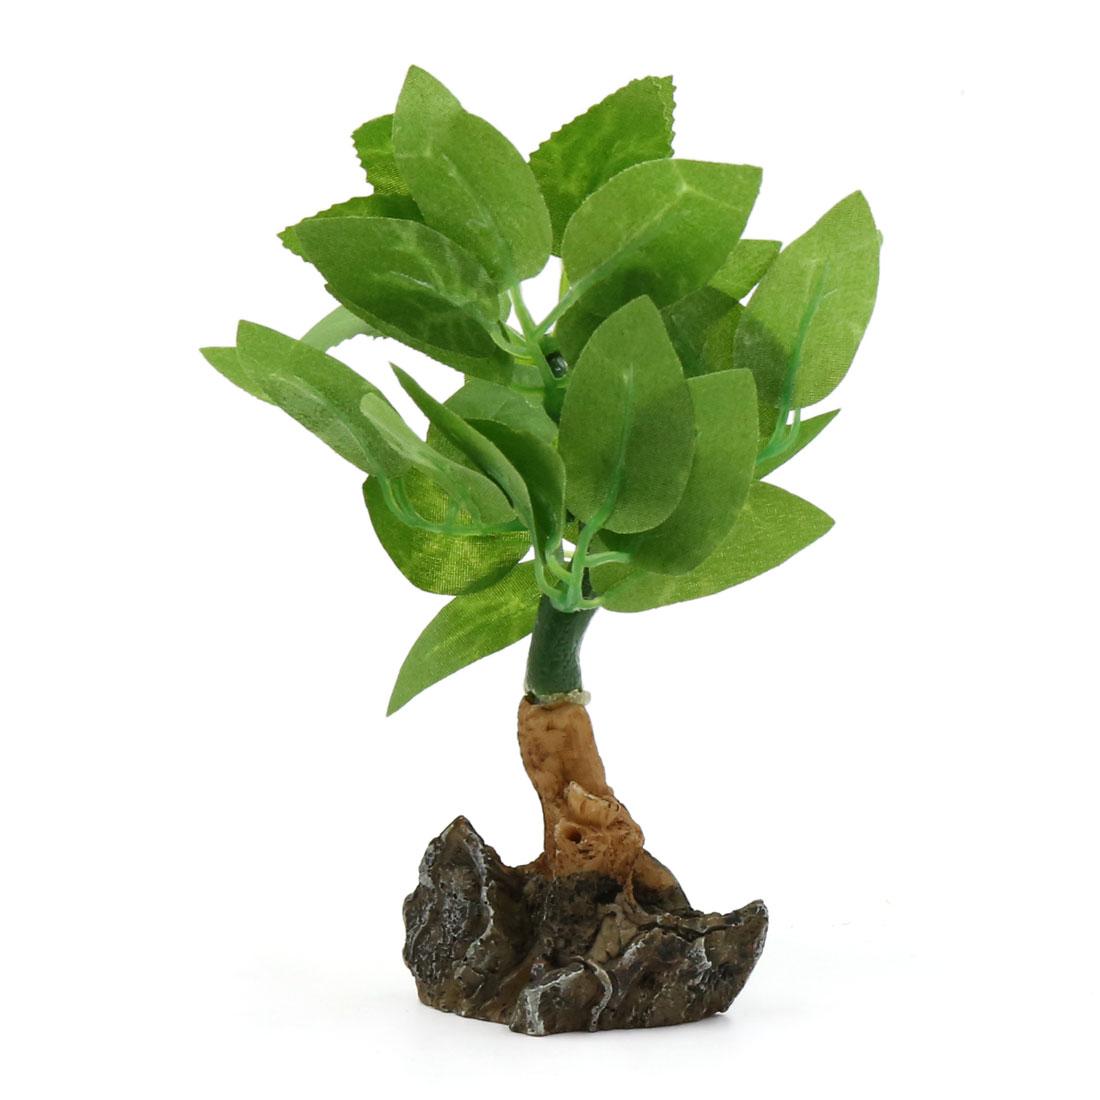 Green Plastic Lifelike Mini Decorative Plant Fsihbowl Aqua Landscape Home Decor